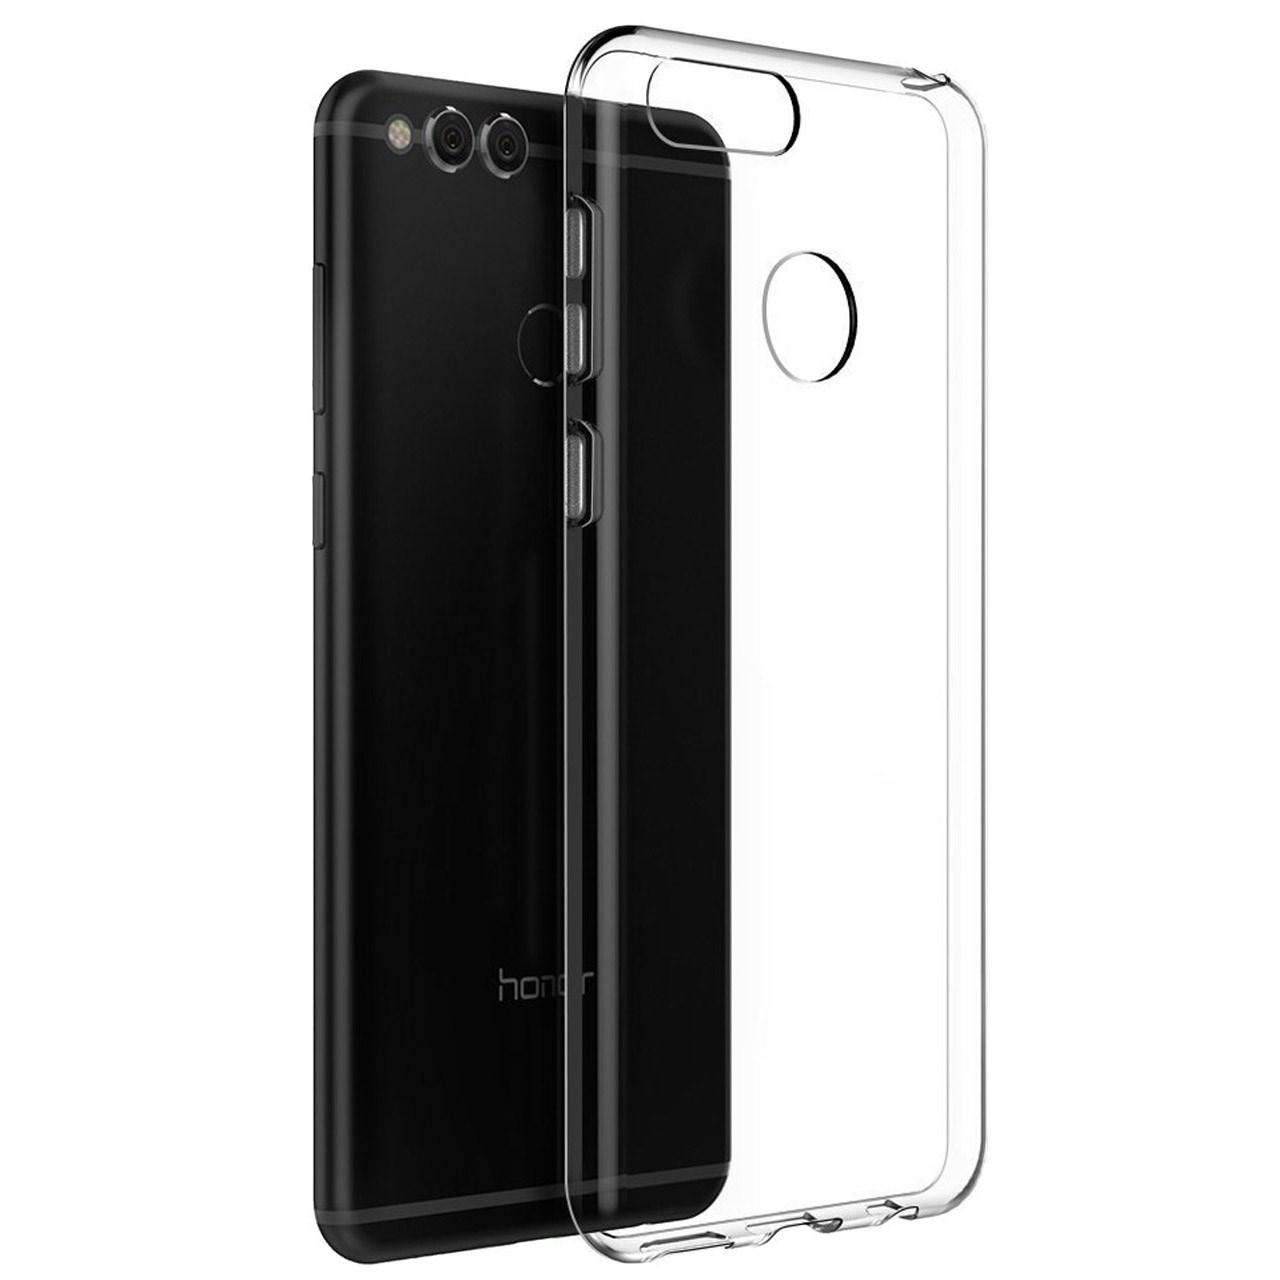 کاور ژله ای مدل ClearJelly مناسب برای گوشی موبایل هوآوی Honor 7X